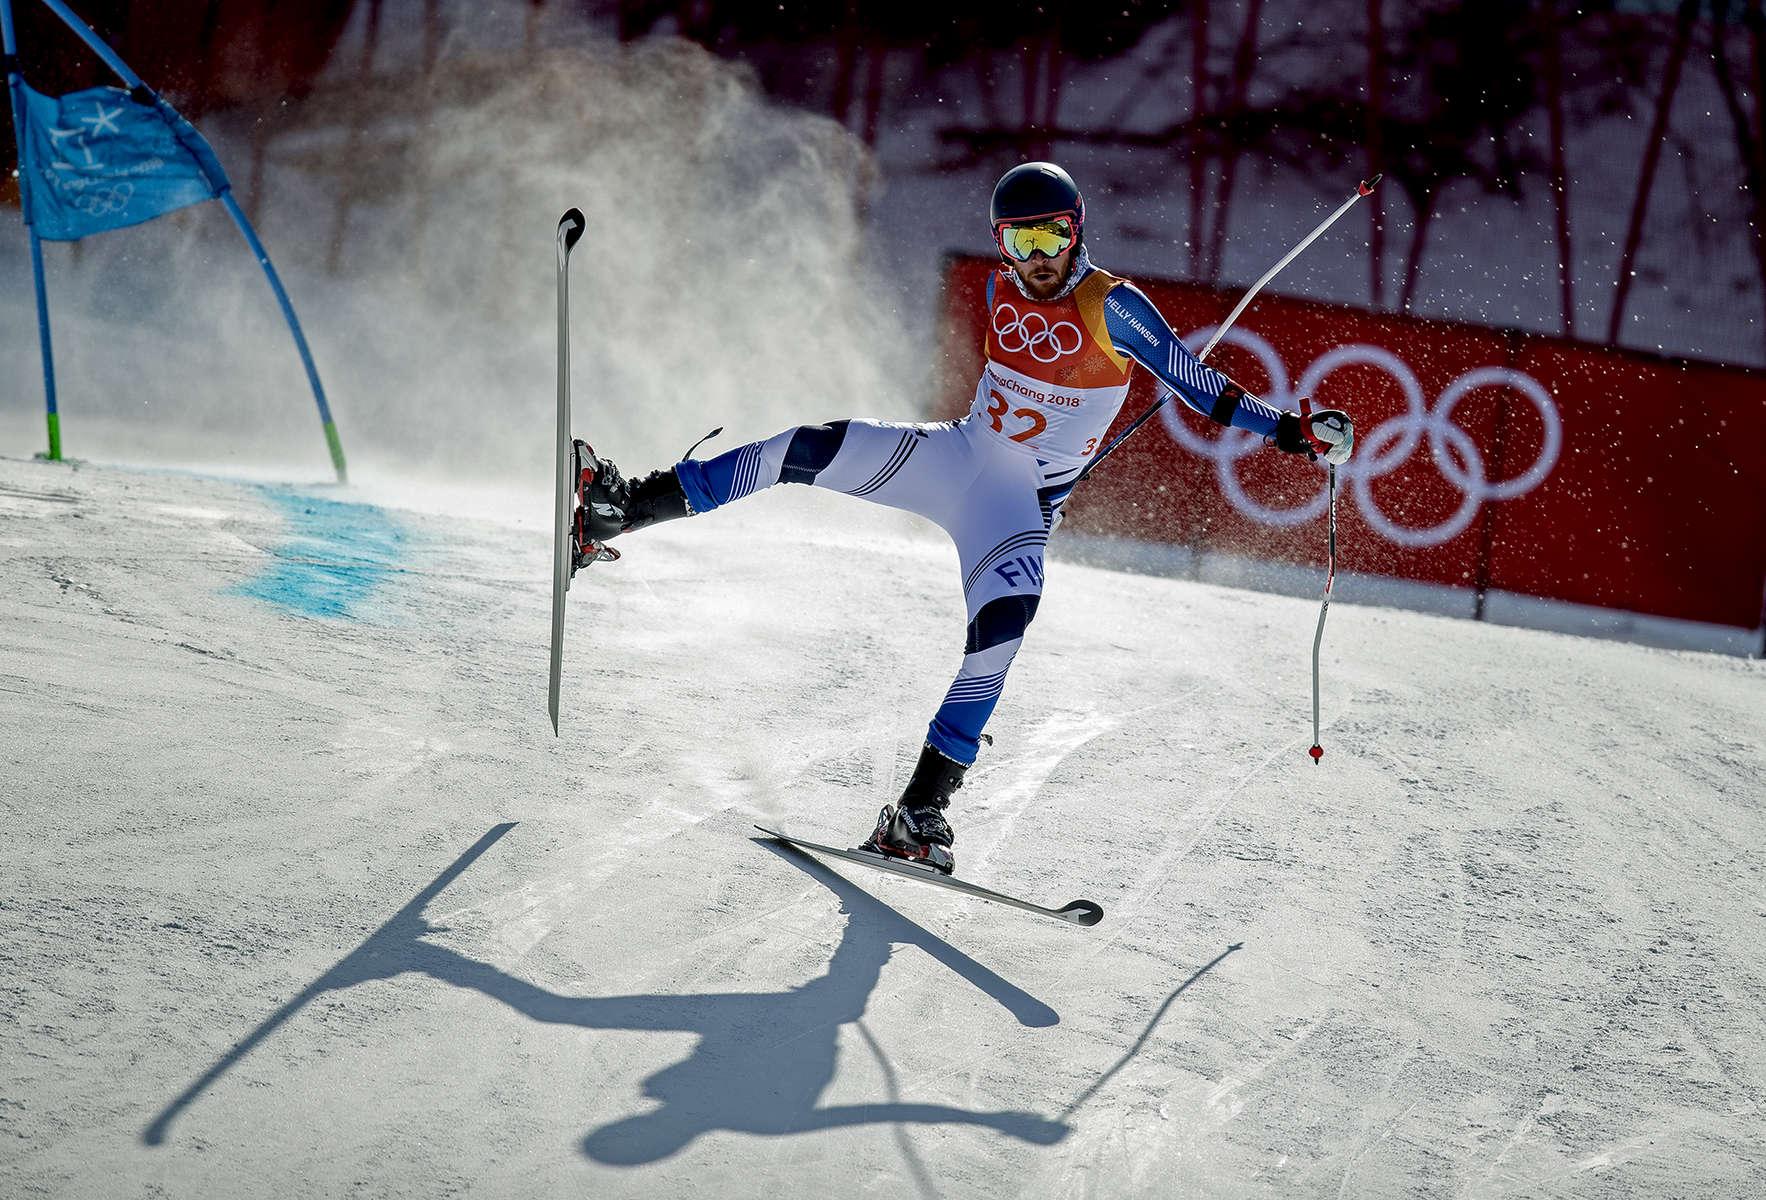 Samu Torsti of Finland crashes during the Alpine Skiing Men's Giant Slalom on day nine of the PyeongChang 2018 Winter Olympic Games at Yongpyong Alpine Centre on February 18, 2018 in Pyeongchang-gun, South Korea.